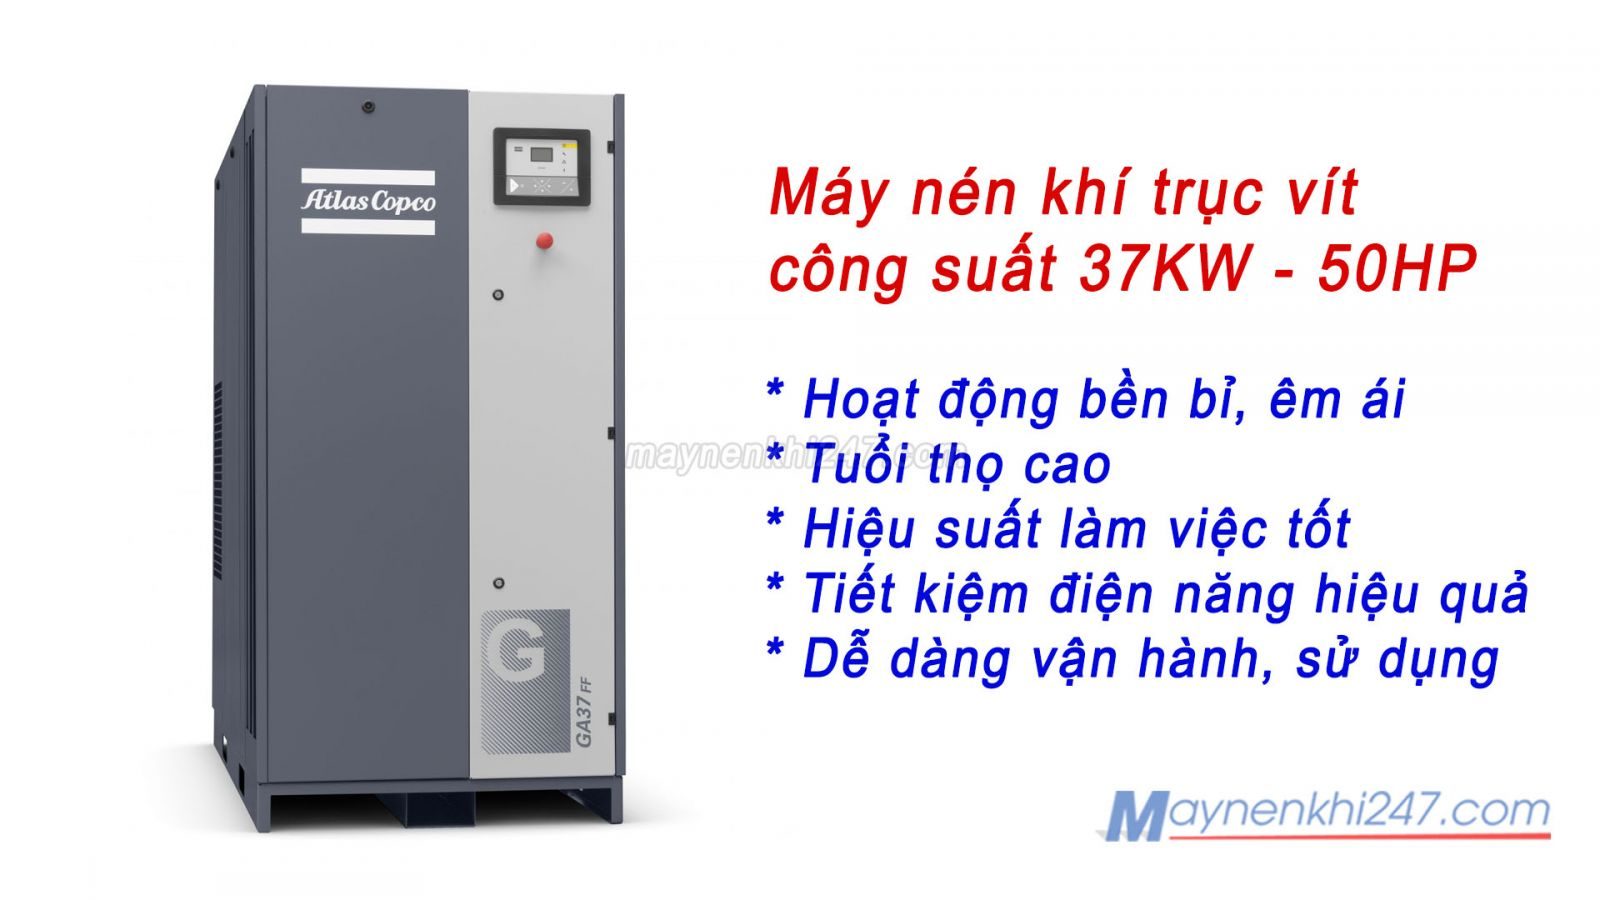 may-nen-khi-truc-vit-37kw-50hp